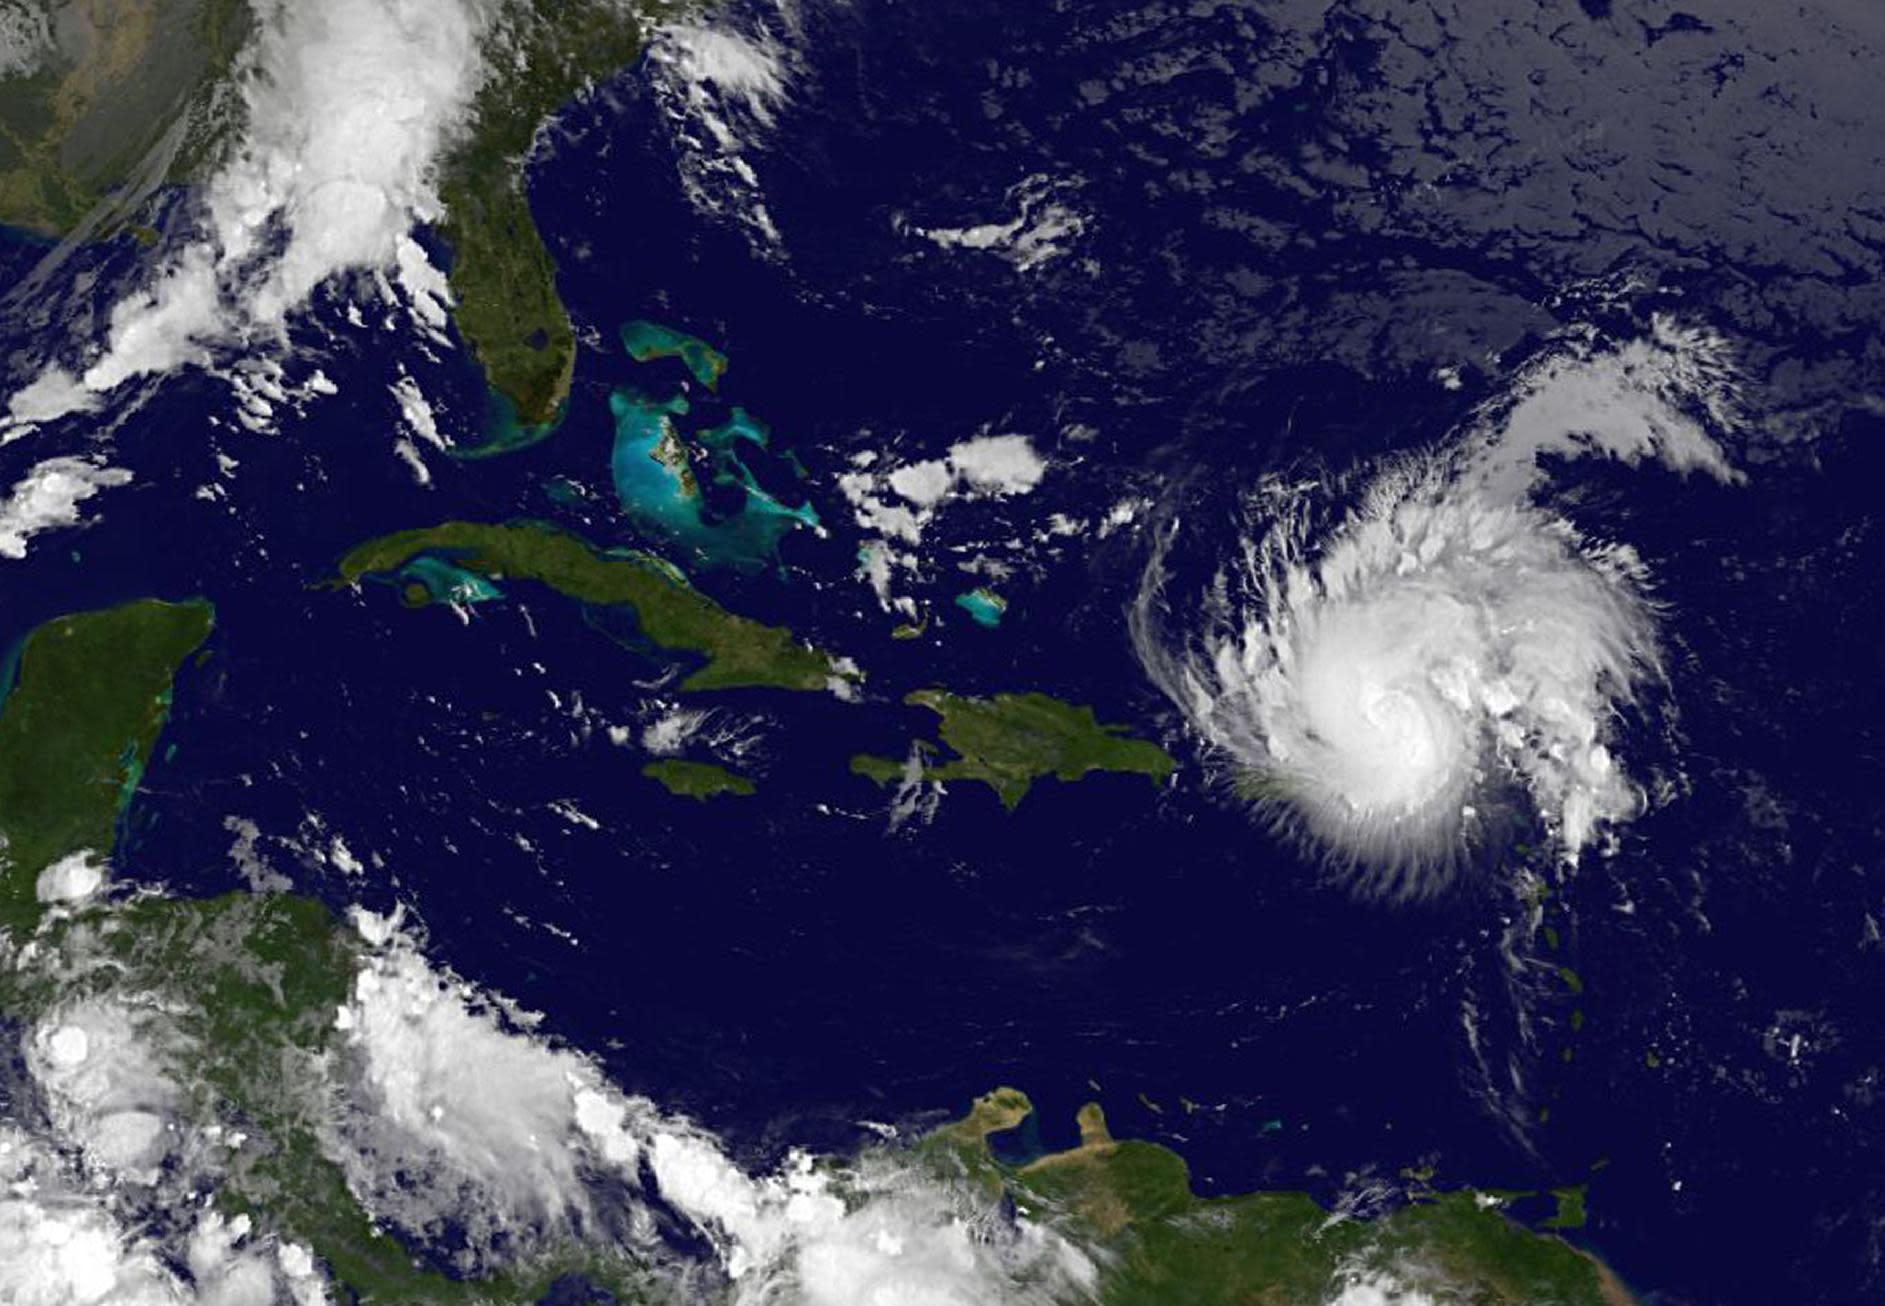 hurricane sandy atlantic ocean nasa - HD1885×1306